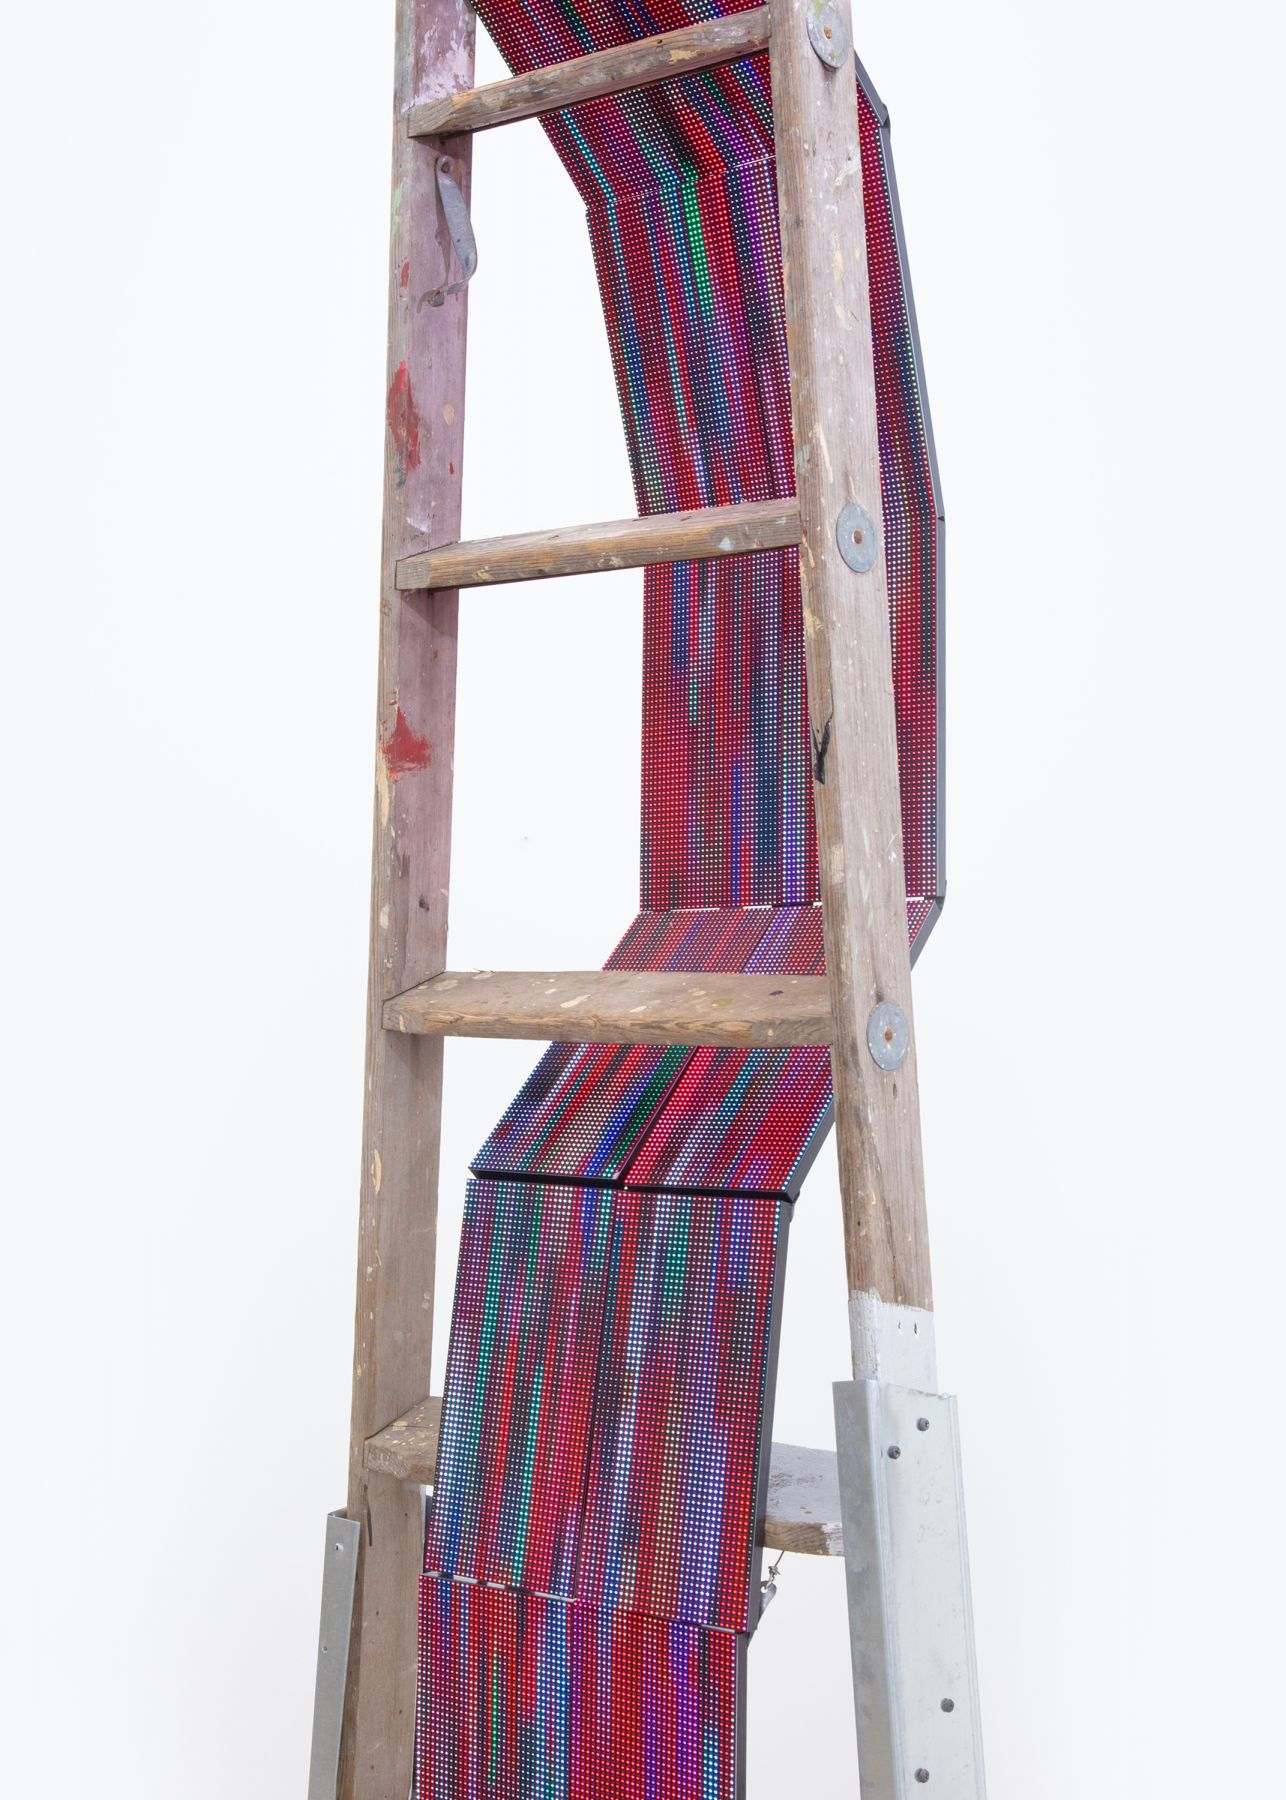 Ladder-Exchange 2